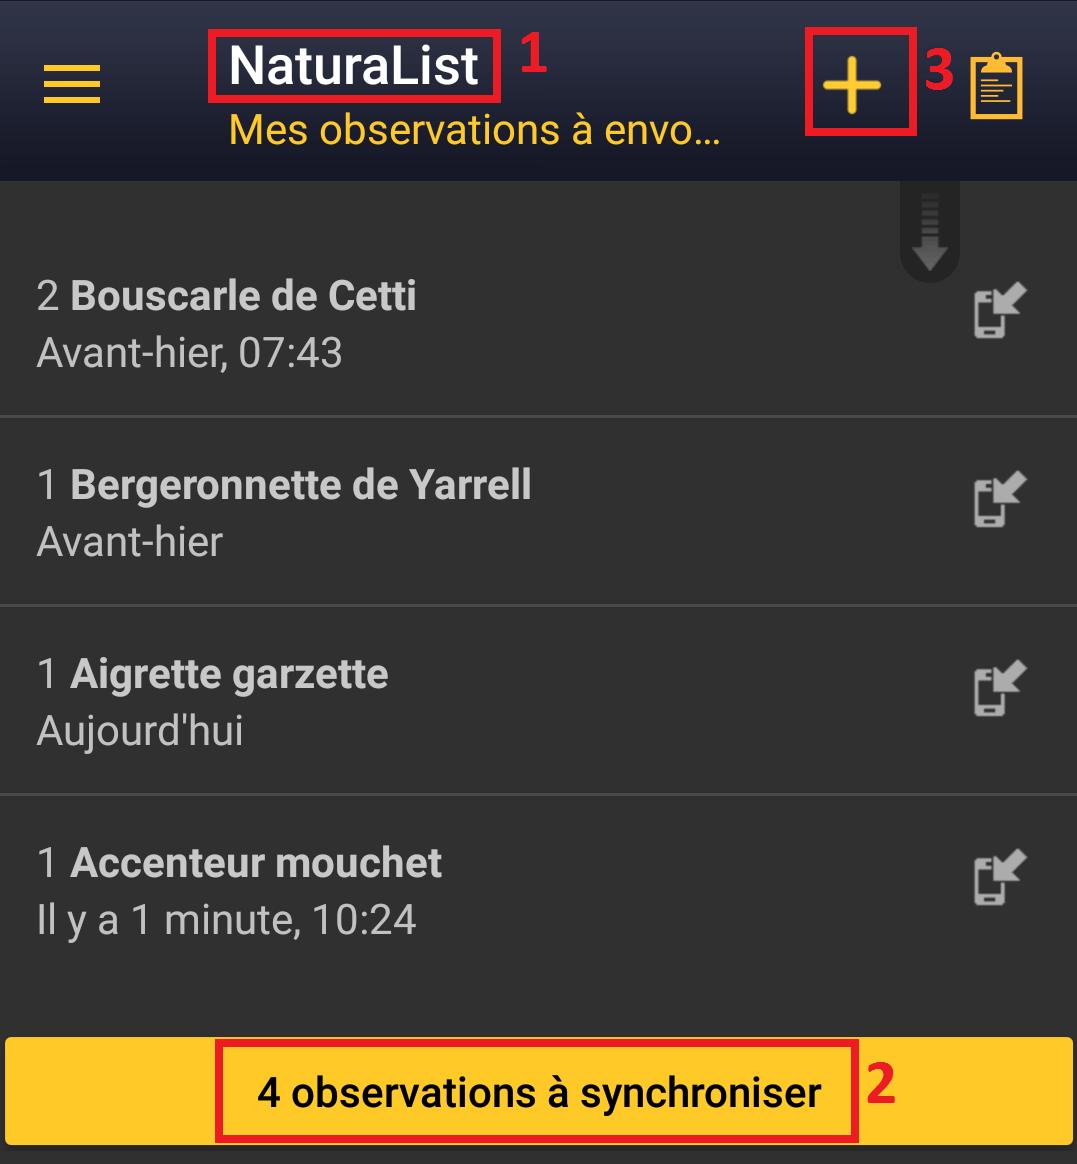 https://cdnfiles1.biolovision.net/www.faune-france.org/userfiles/ListeNaturaList/10-synchroniser-obs.png